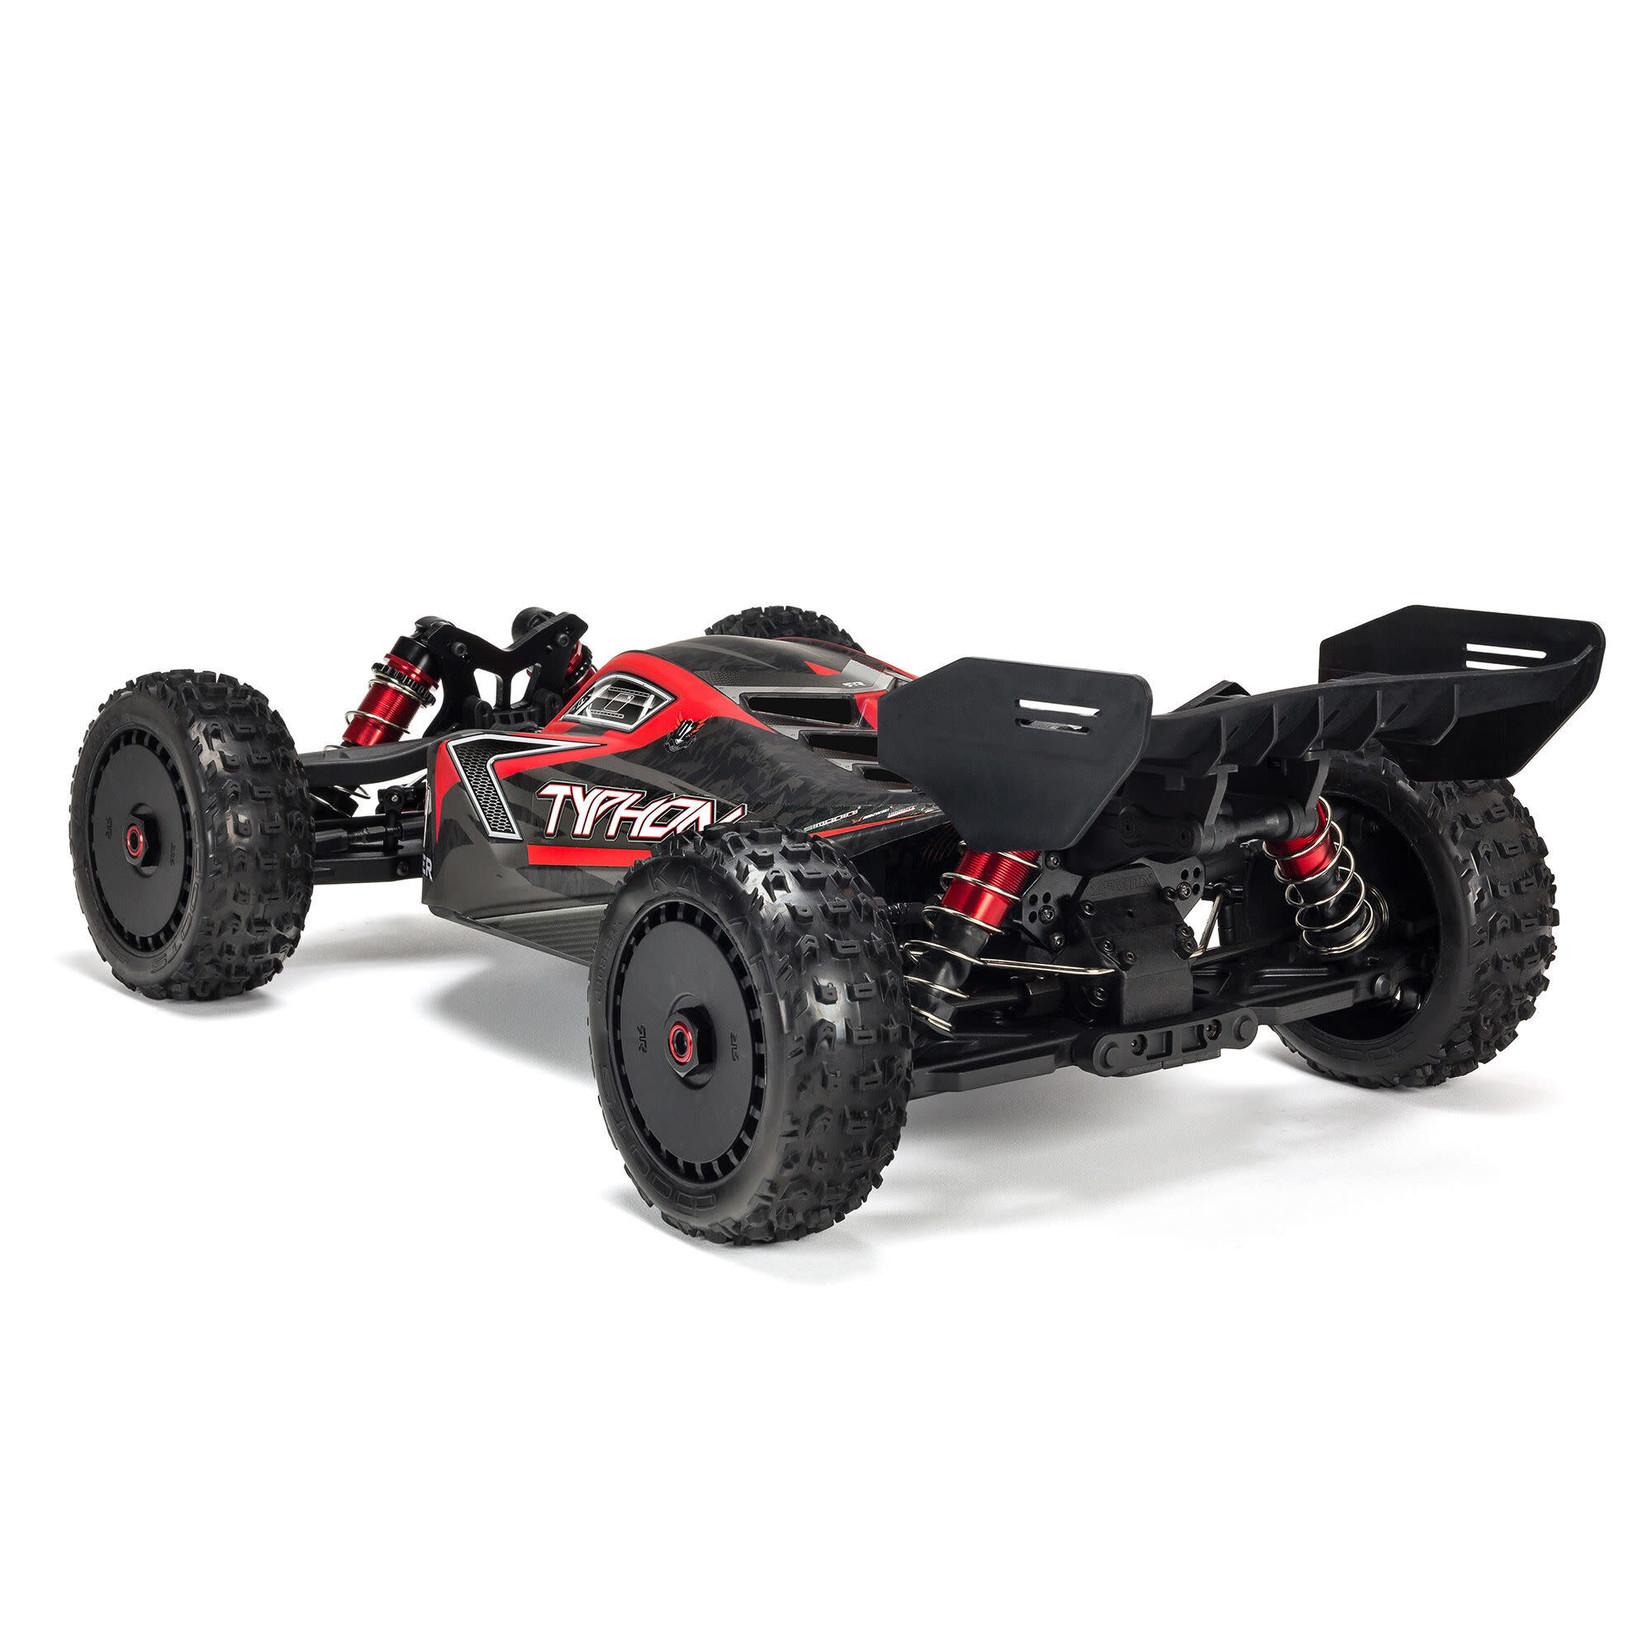 ARRMA ARA8606V5 Arrma 1/8 TYPHON 6S V5 4WD BLX Buggy with Spektrum Firma RTR, Black